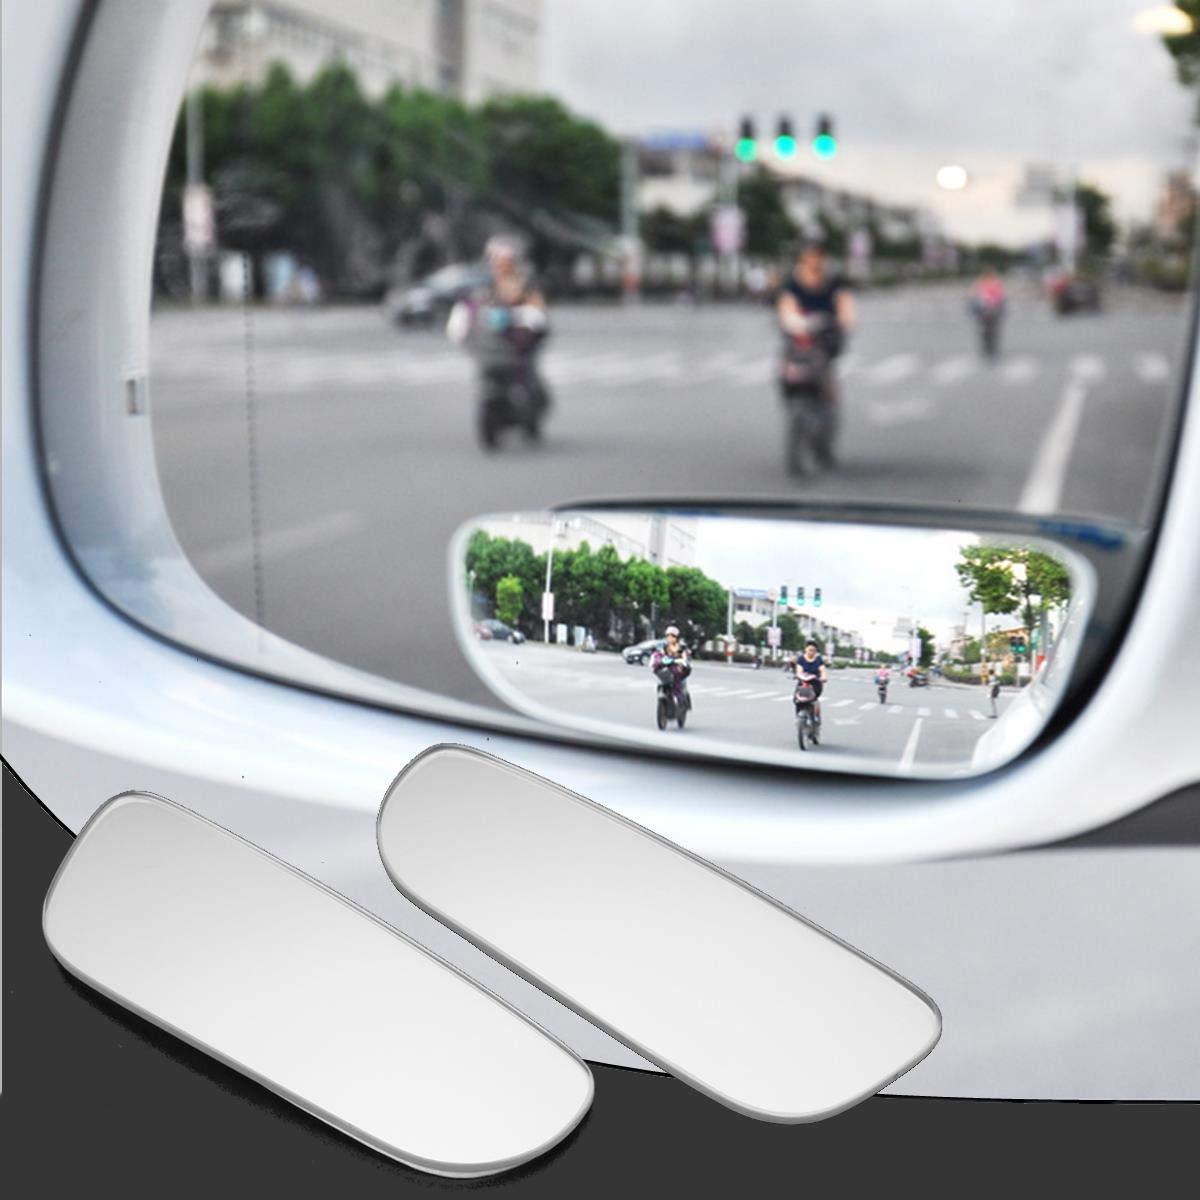 2pcs Slim Car Rear View Blind Spot Mirror 360° Rotating Convex Wide Angle Glass Mirror - Interior Accessories Interior Mirrors - 2 X Rear View Blind Spot Mirror